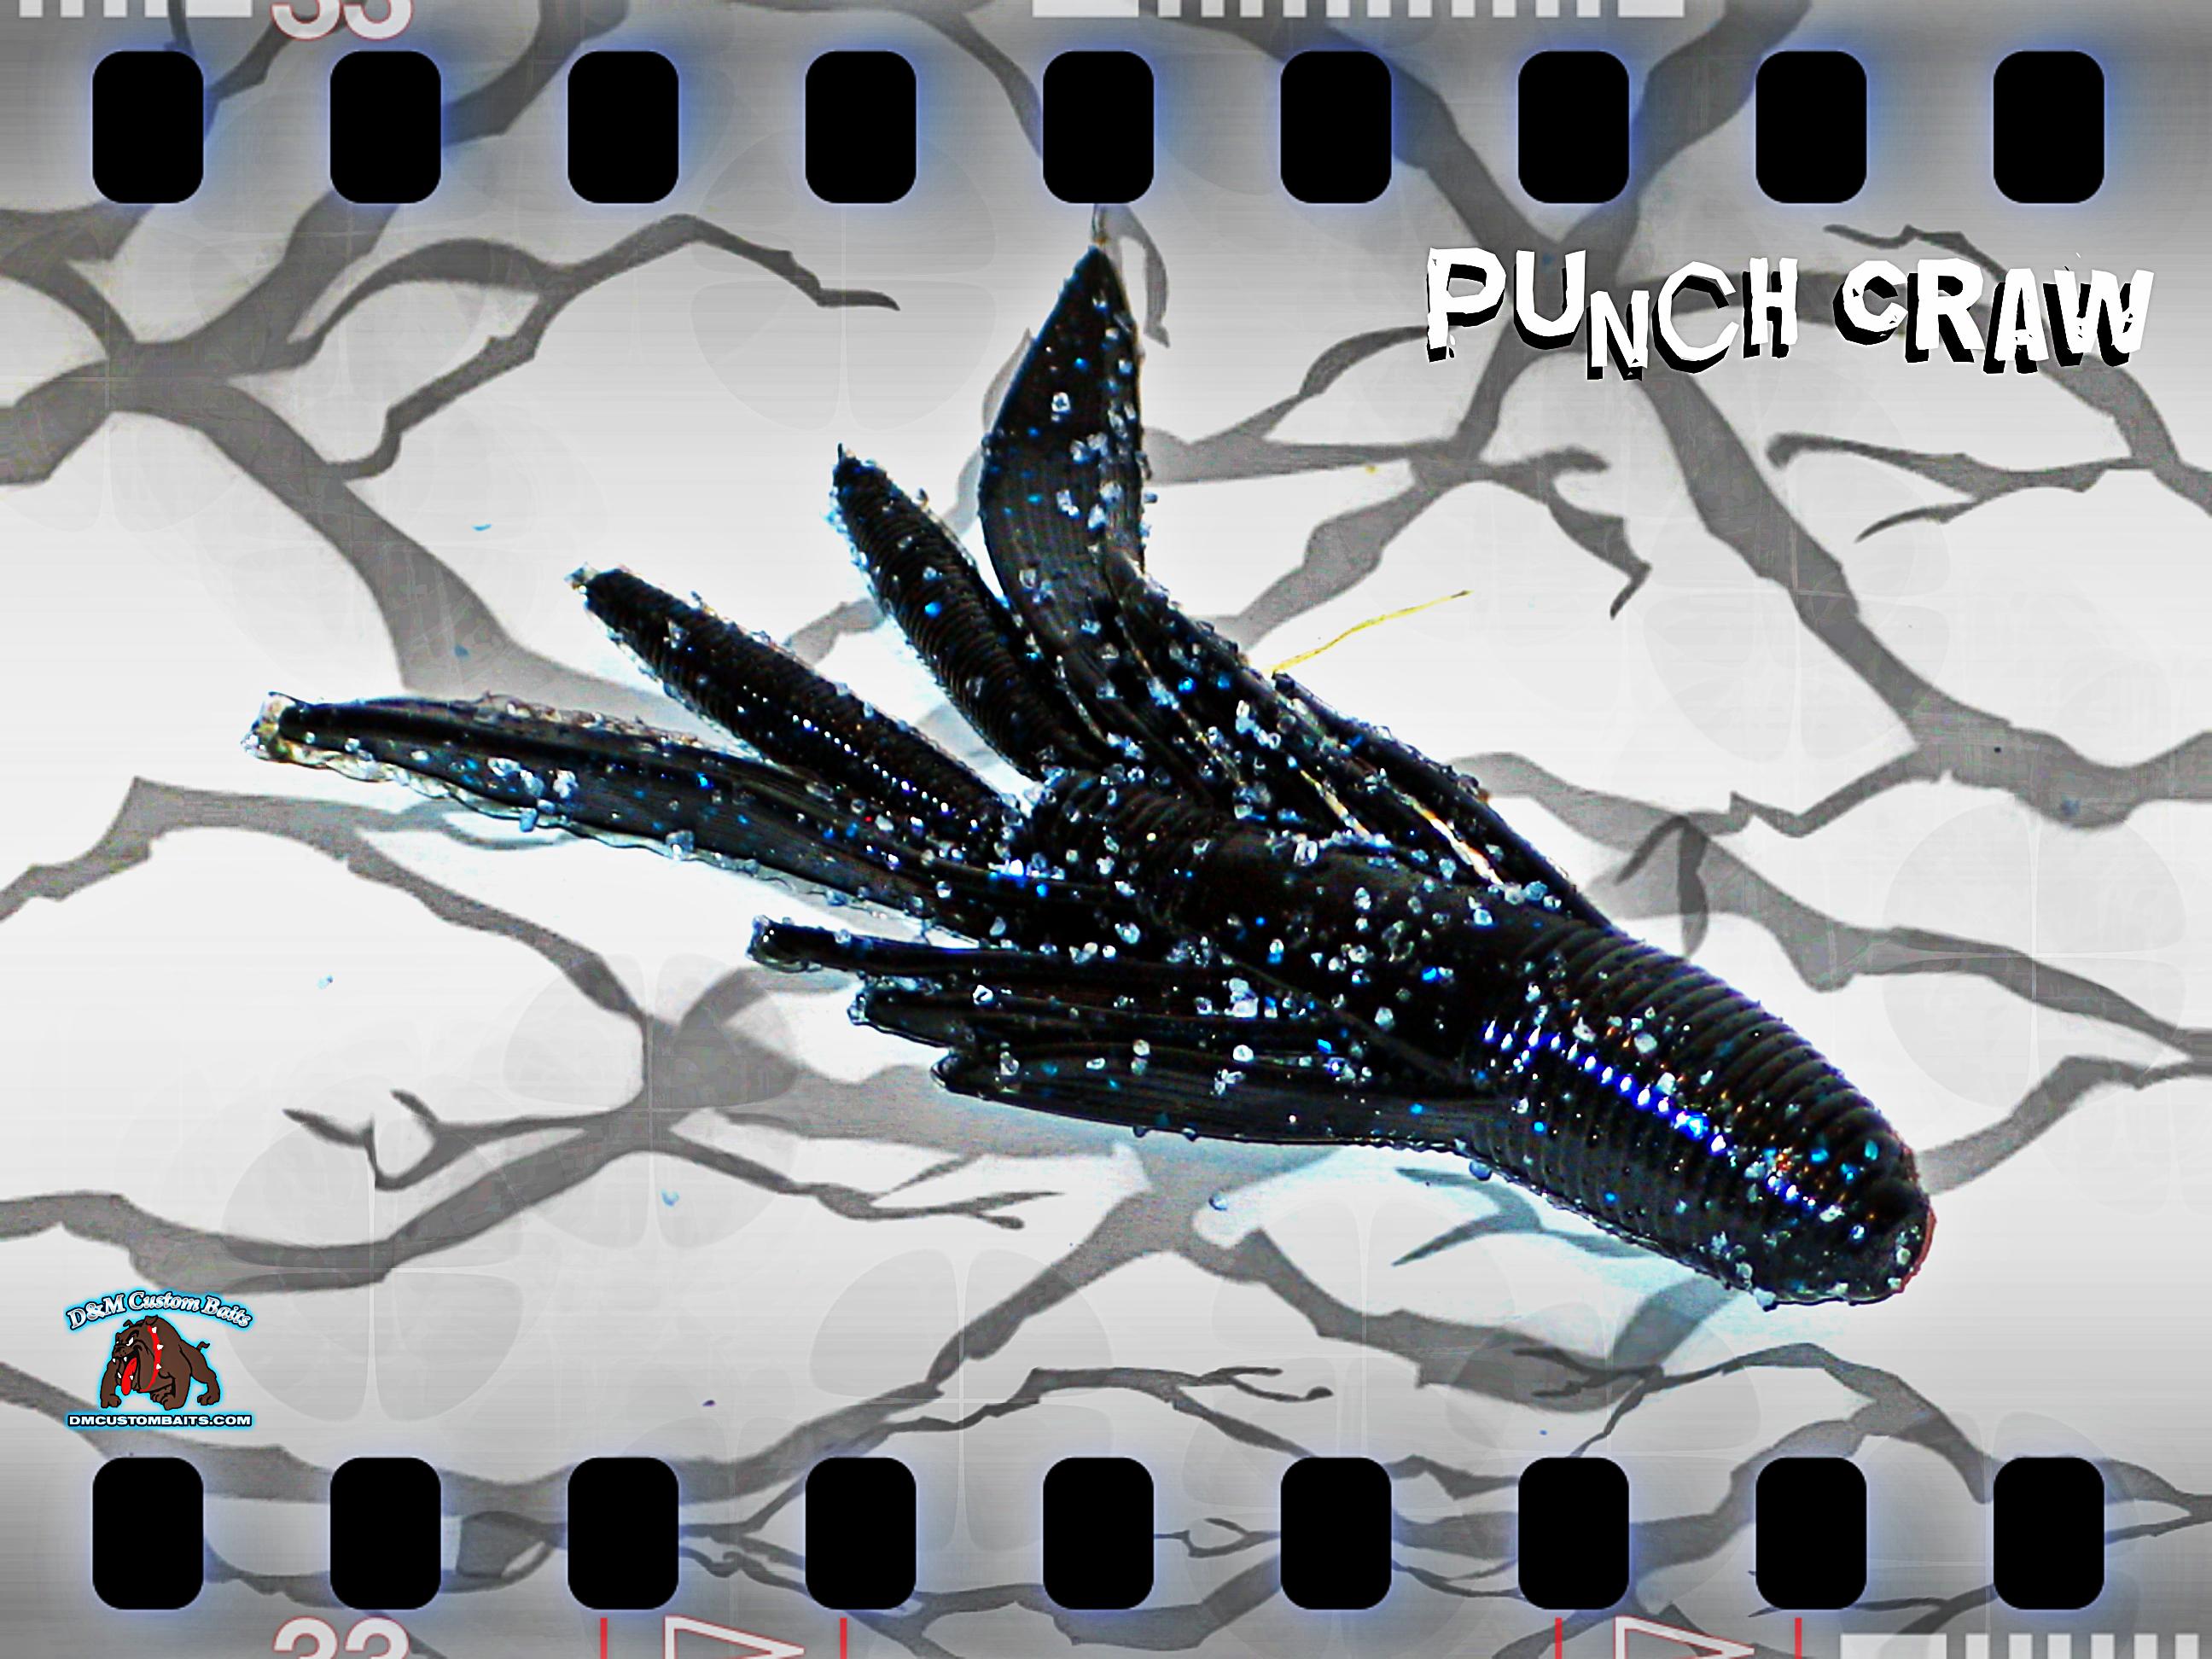 d&m custom baits punch craw